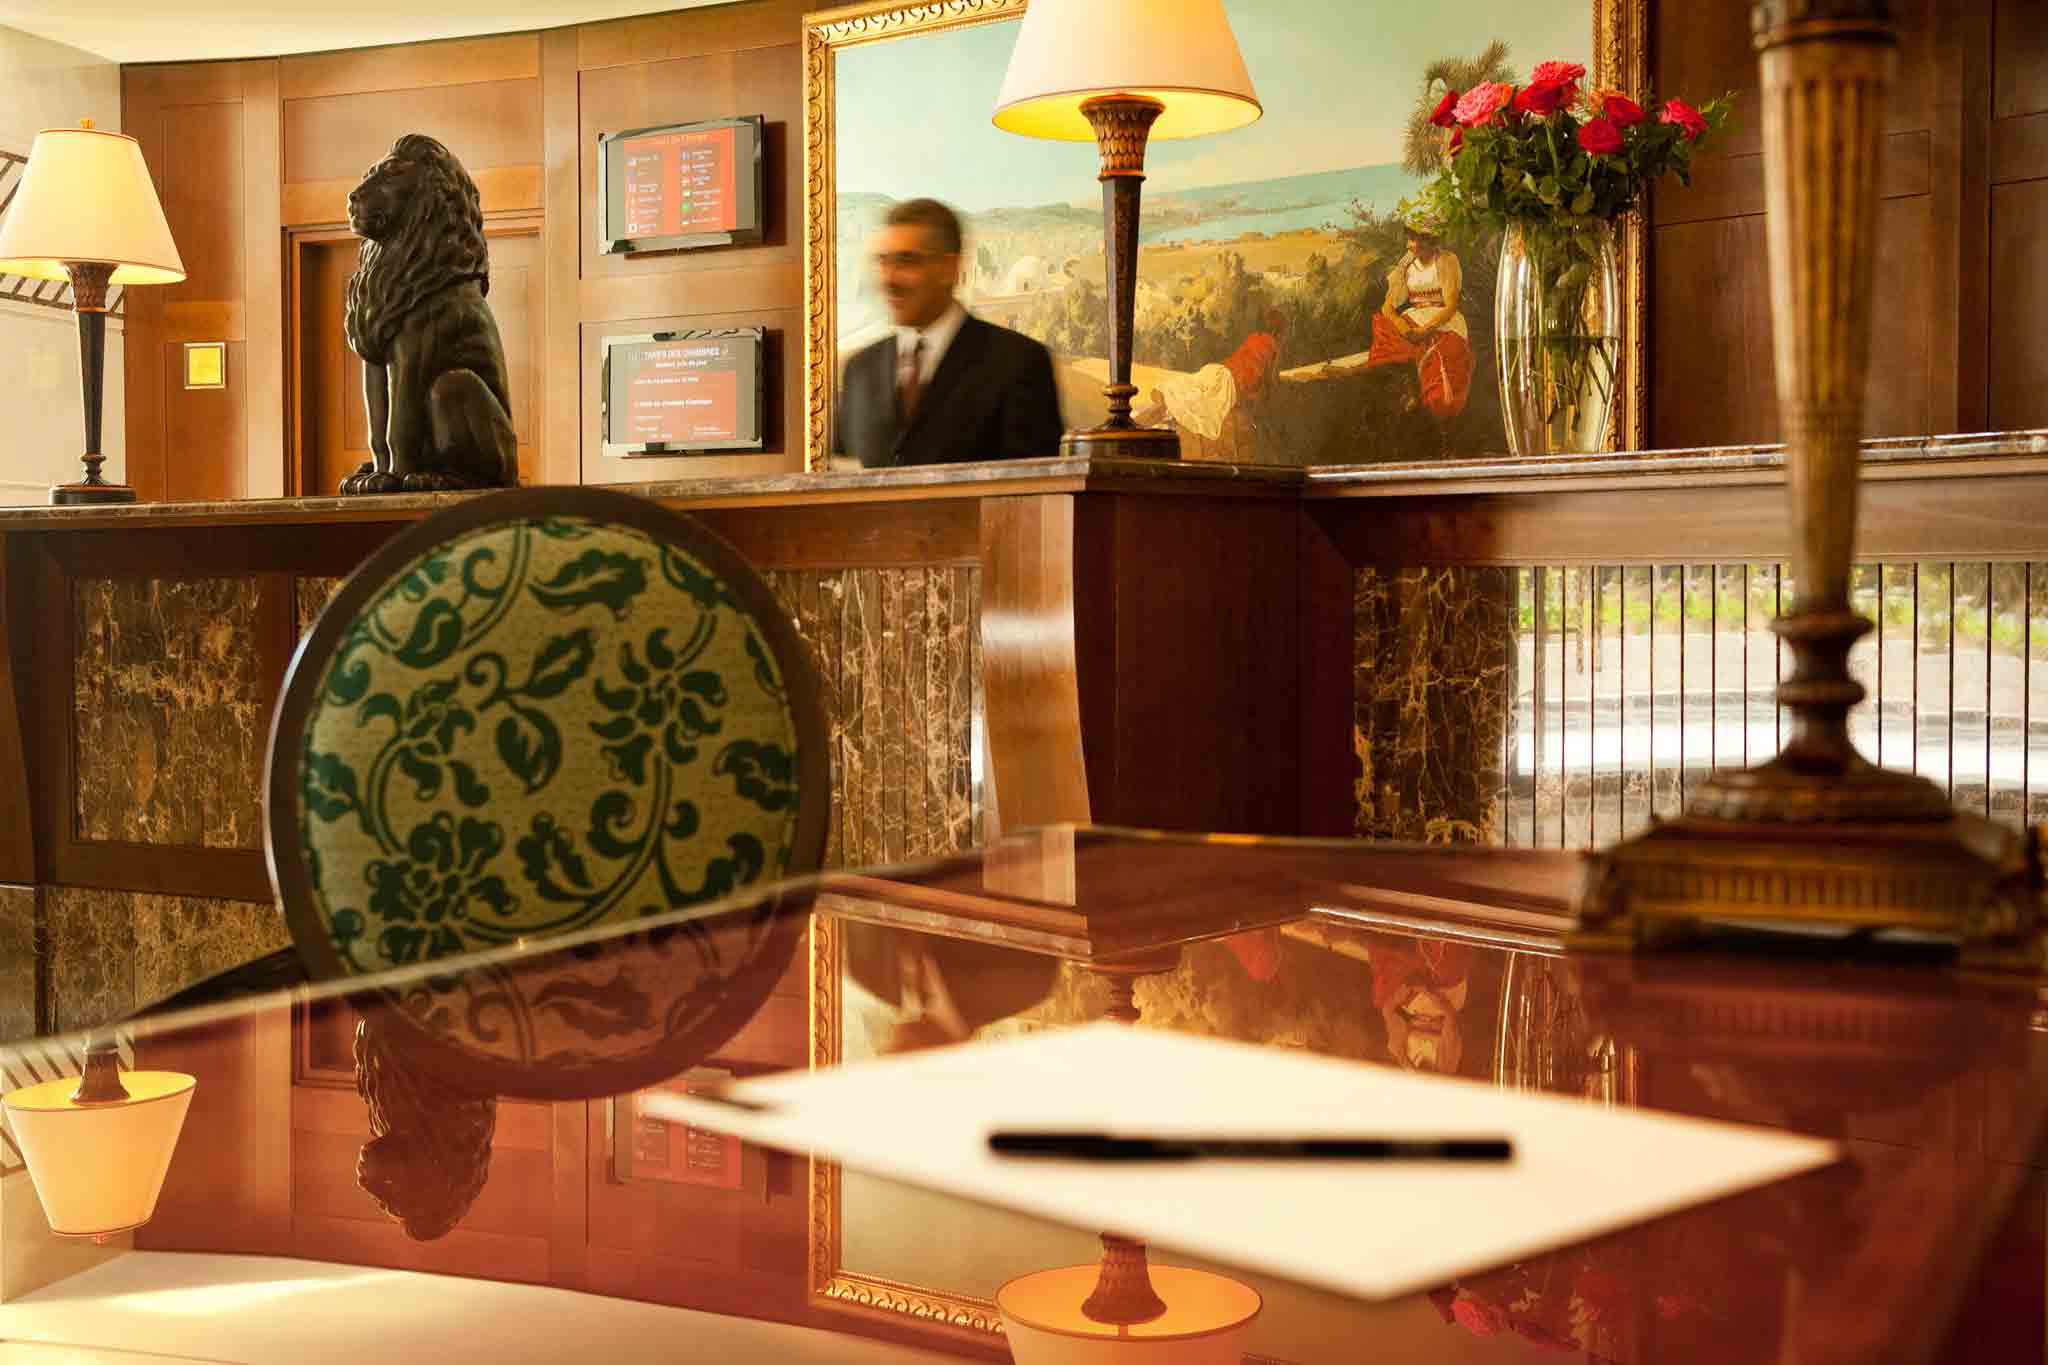 Jacques delfini directeur g n ral de royal hotel oran for Numero de chambre hotel